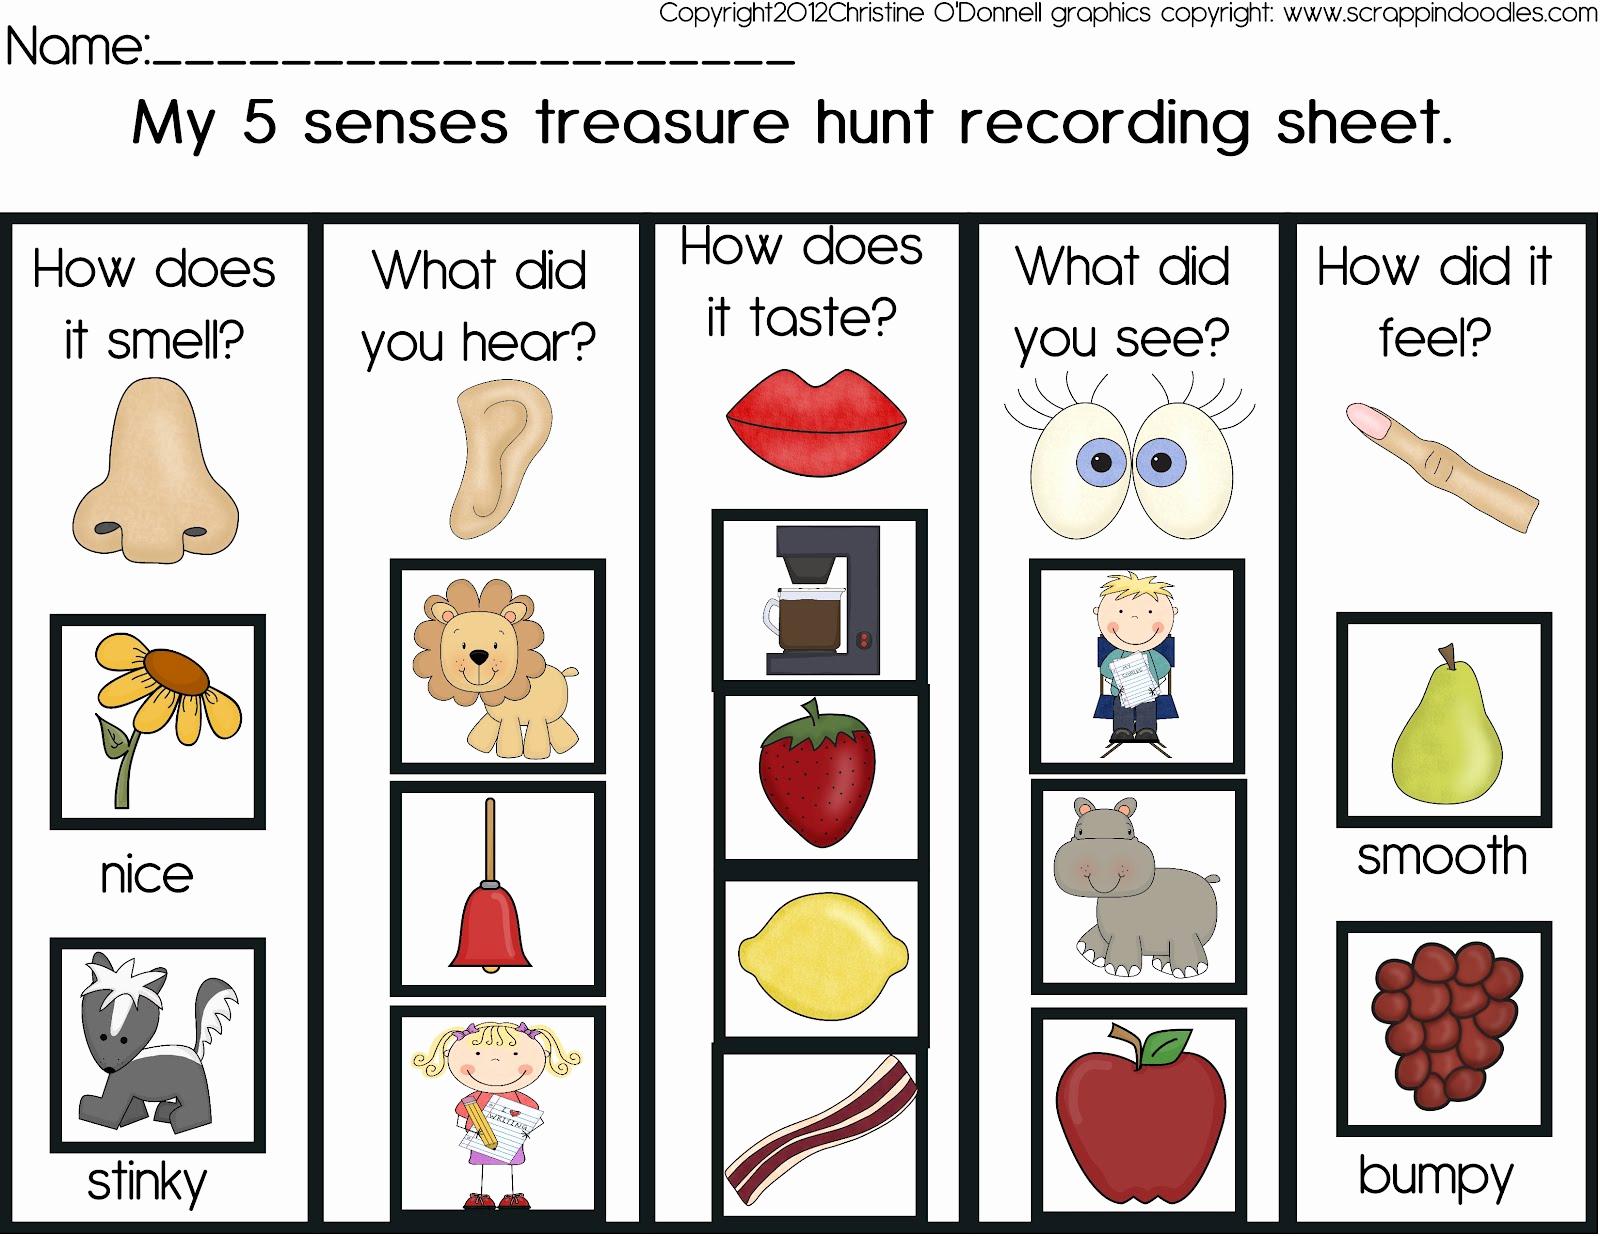 Five Senses Worksheets for Kindergarten New 5 Senses Treasure Hunt and A Freebie